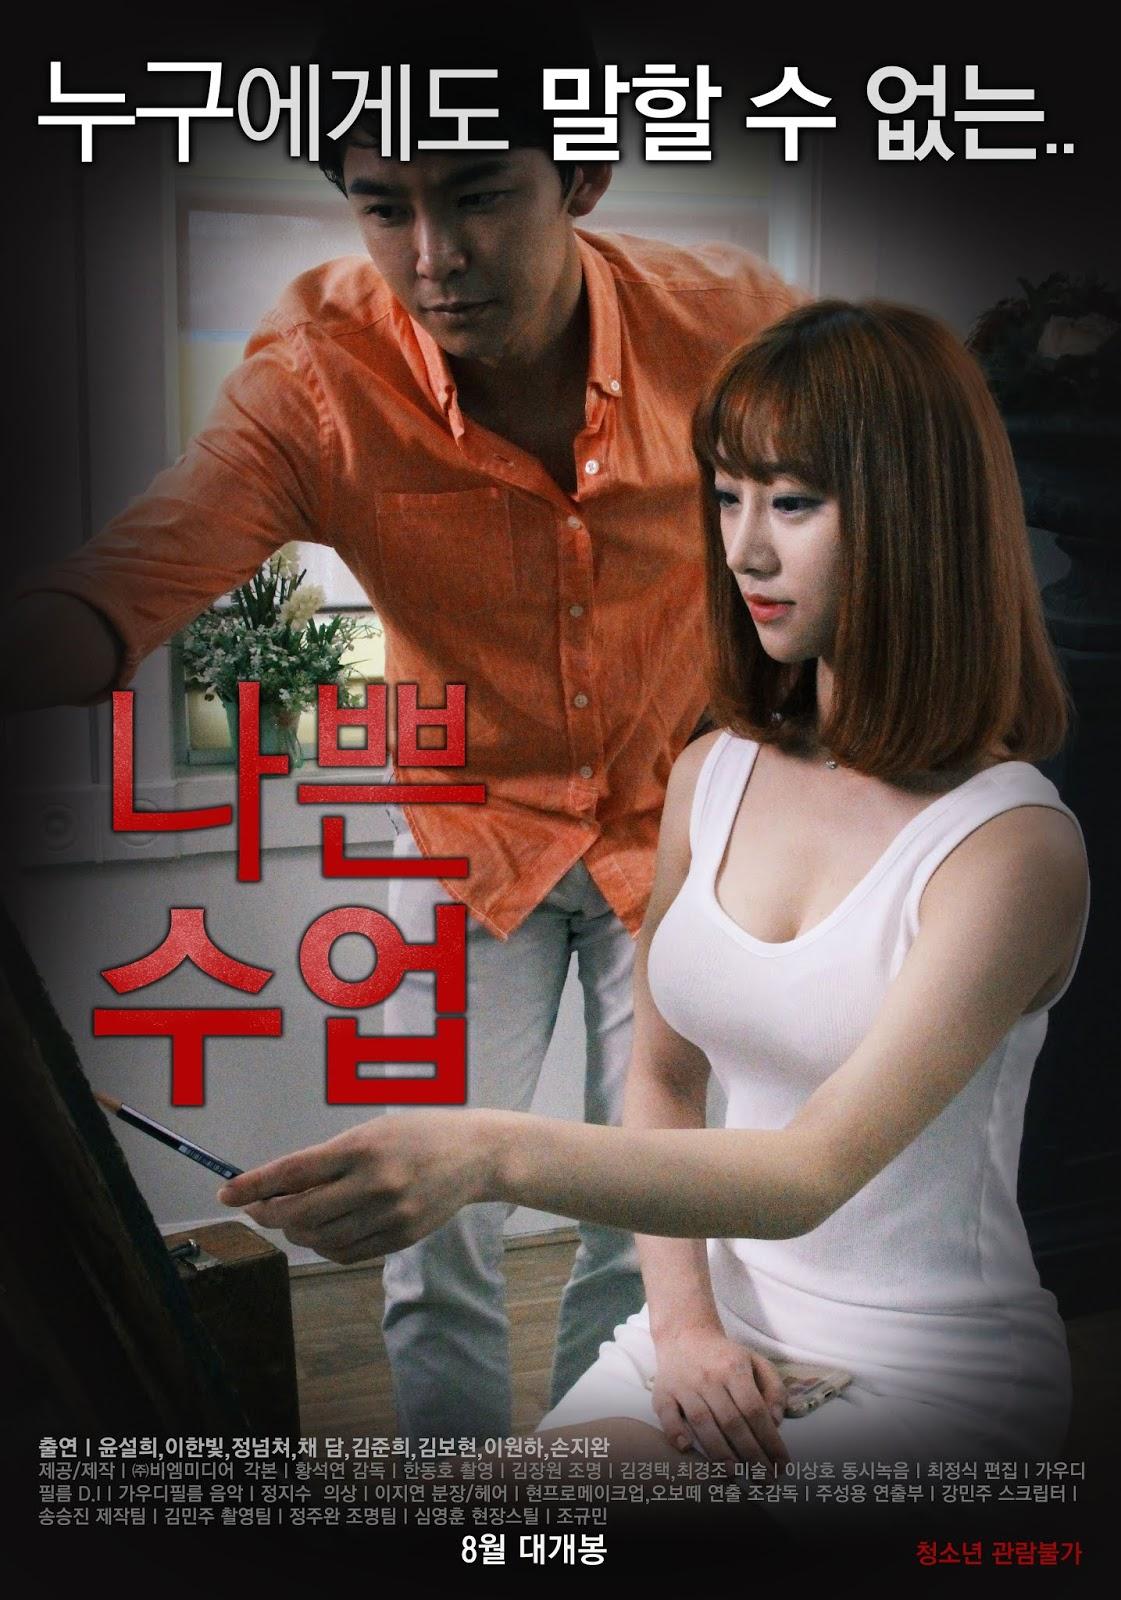 Bad Class Full Korea 18+ Adult Movie Online Free